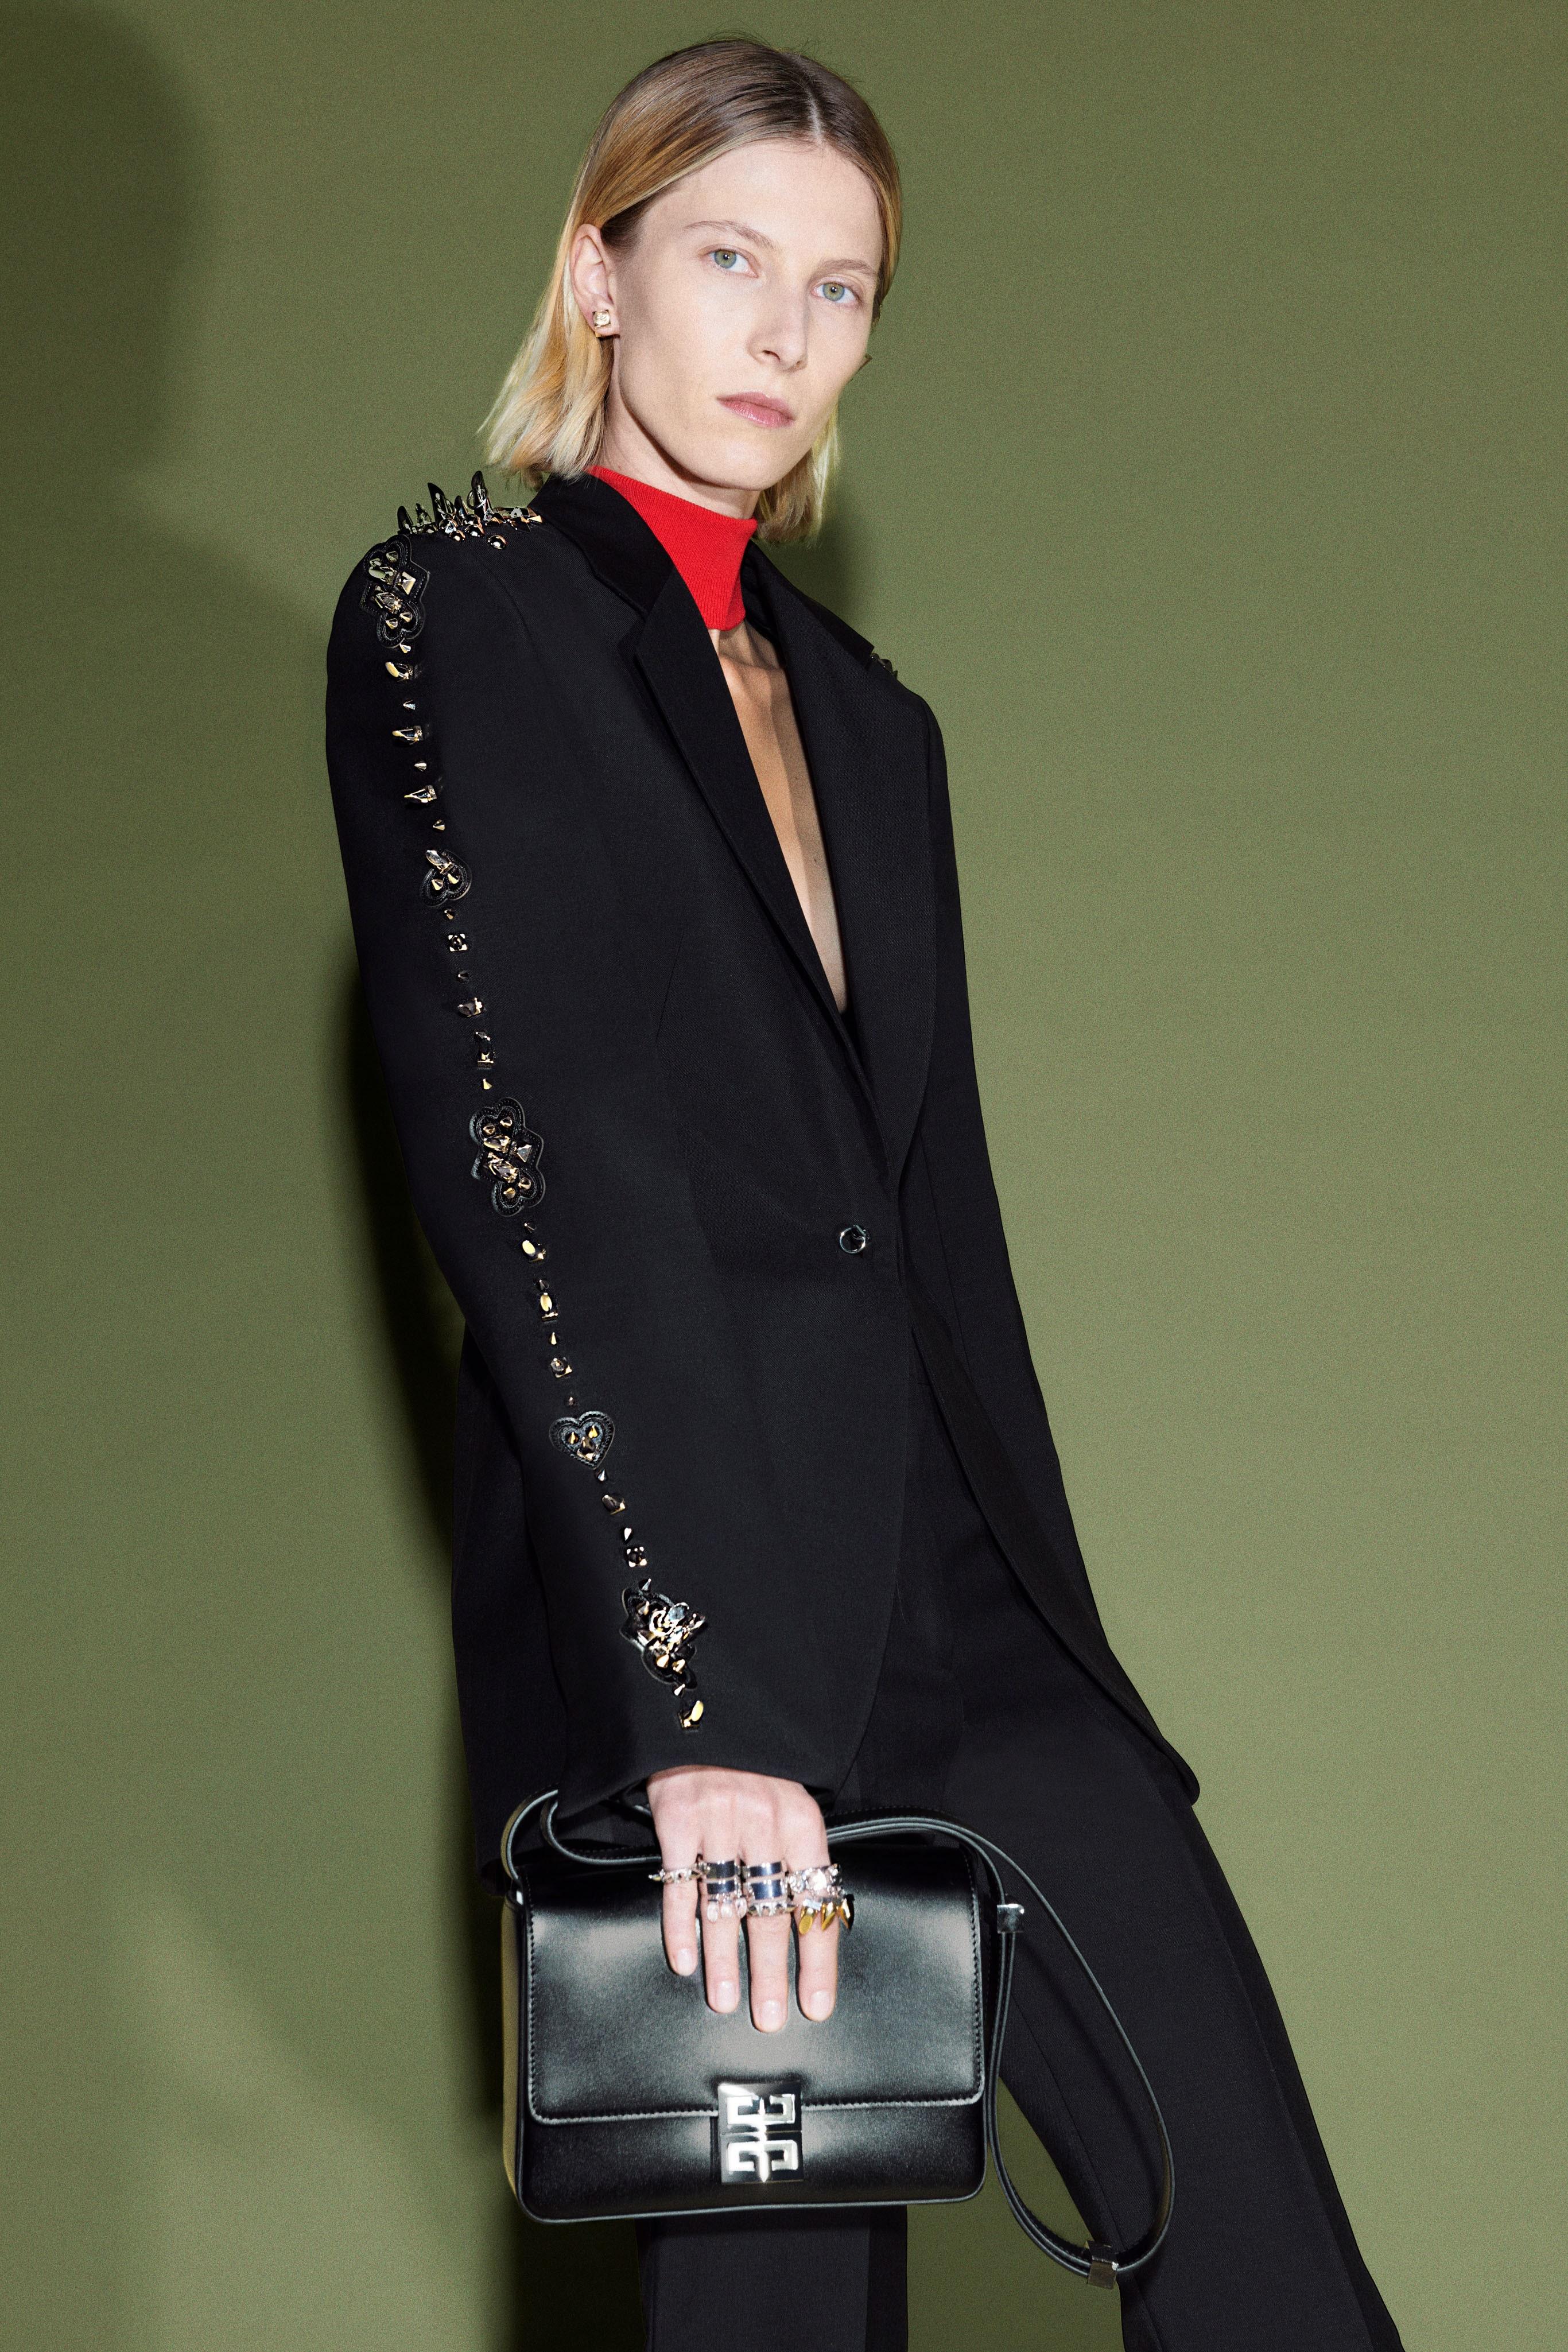 00006-Givenchy-Pre-Fall-21